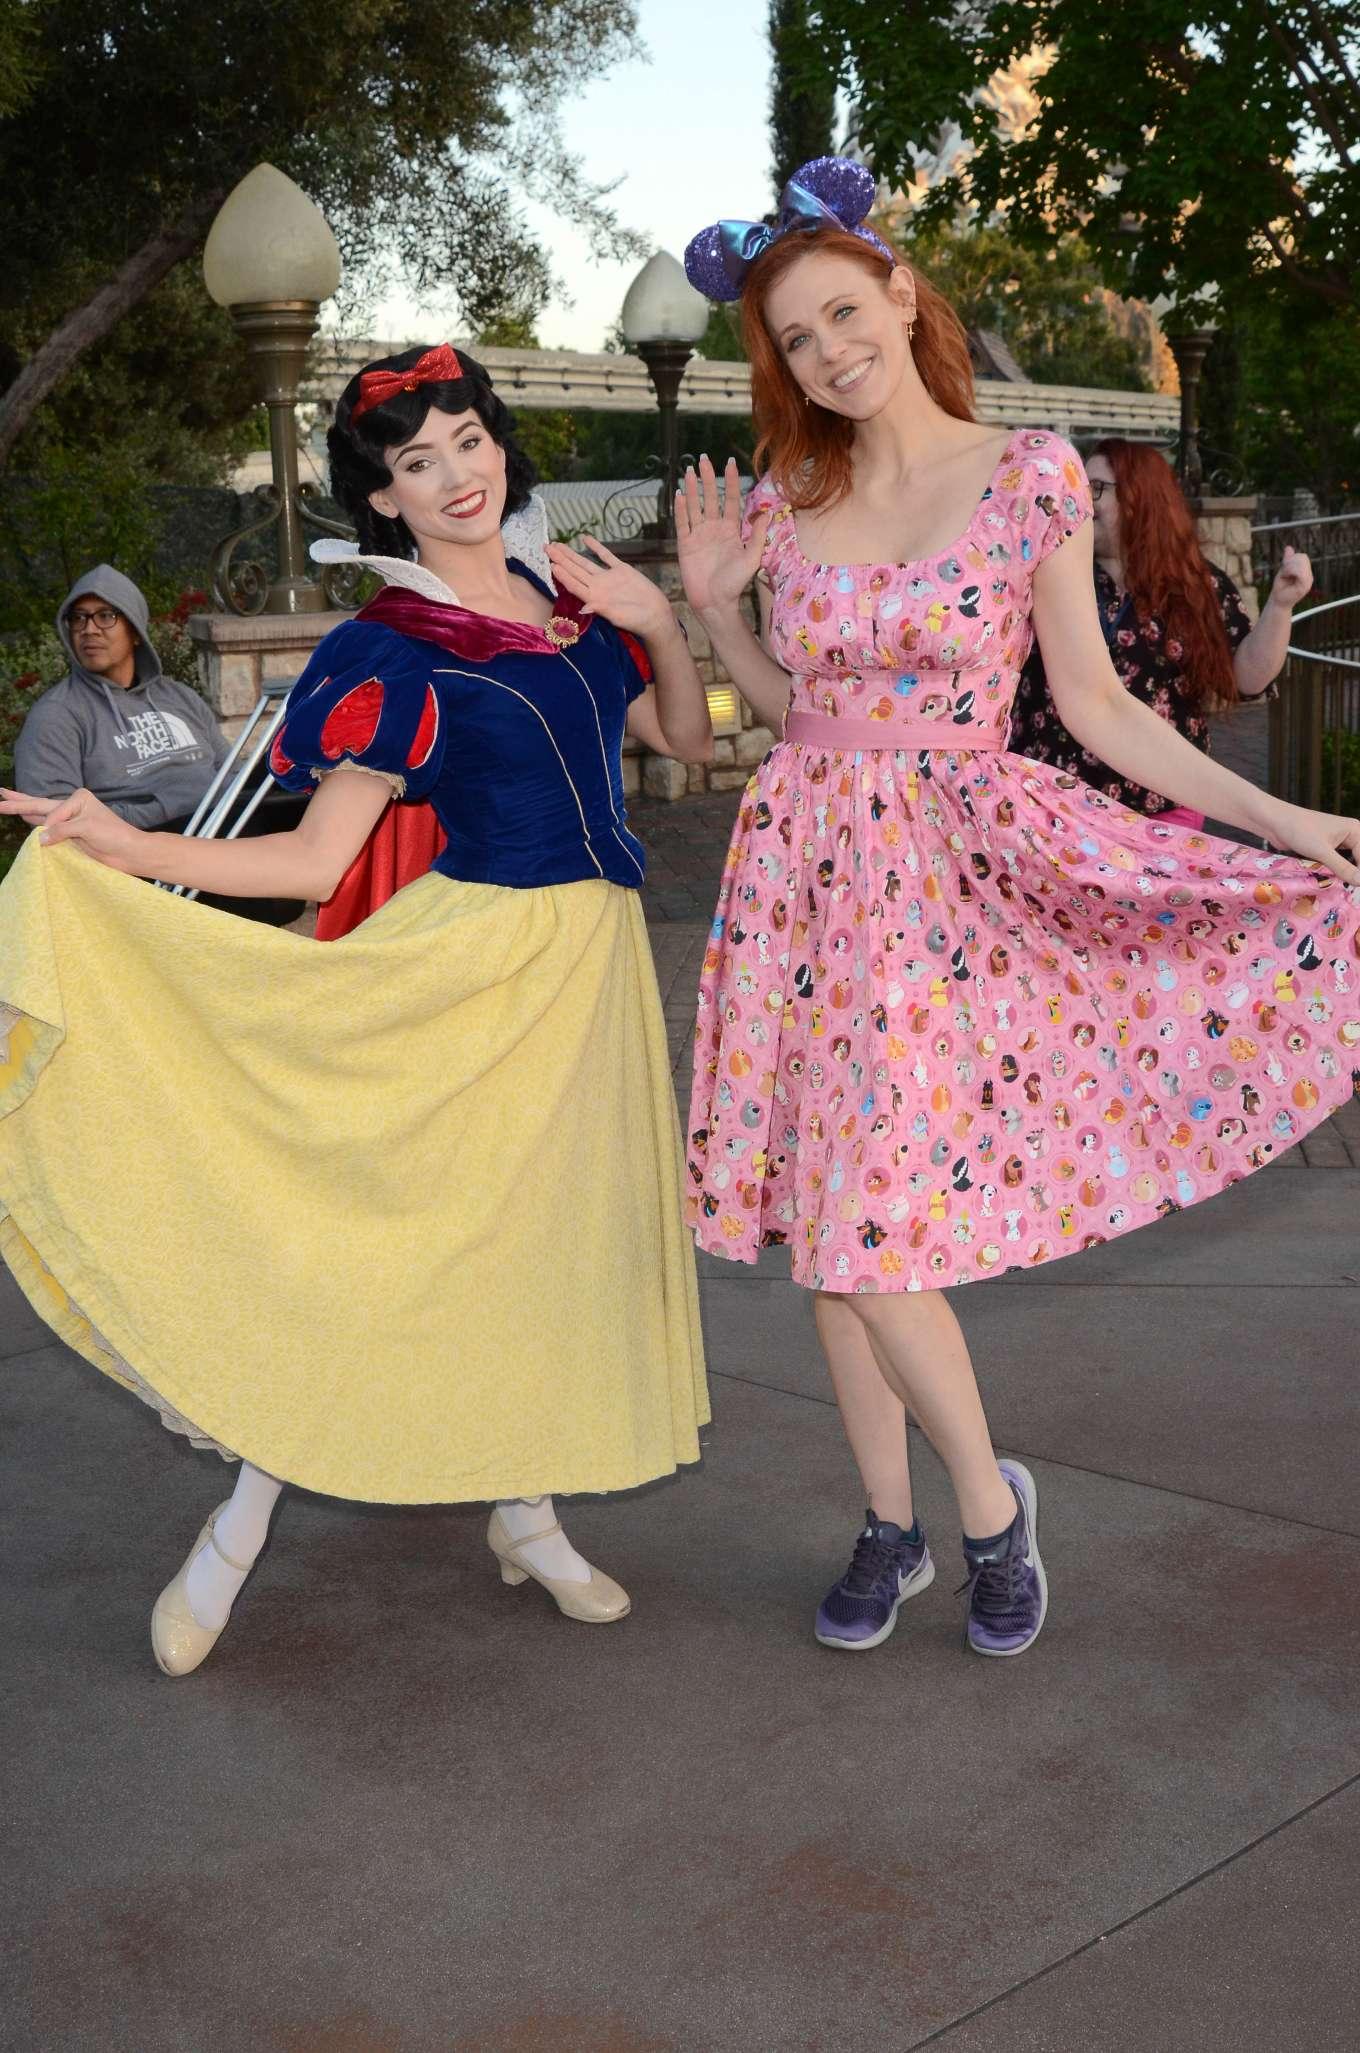 Maitland Ward 2019 : Maitland Ward: Celebrating International Star Wars Day at Disneyland -11